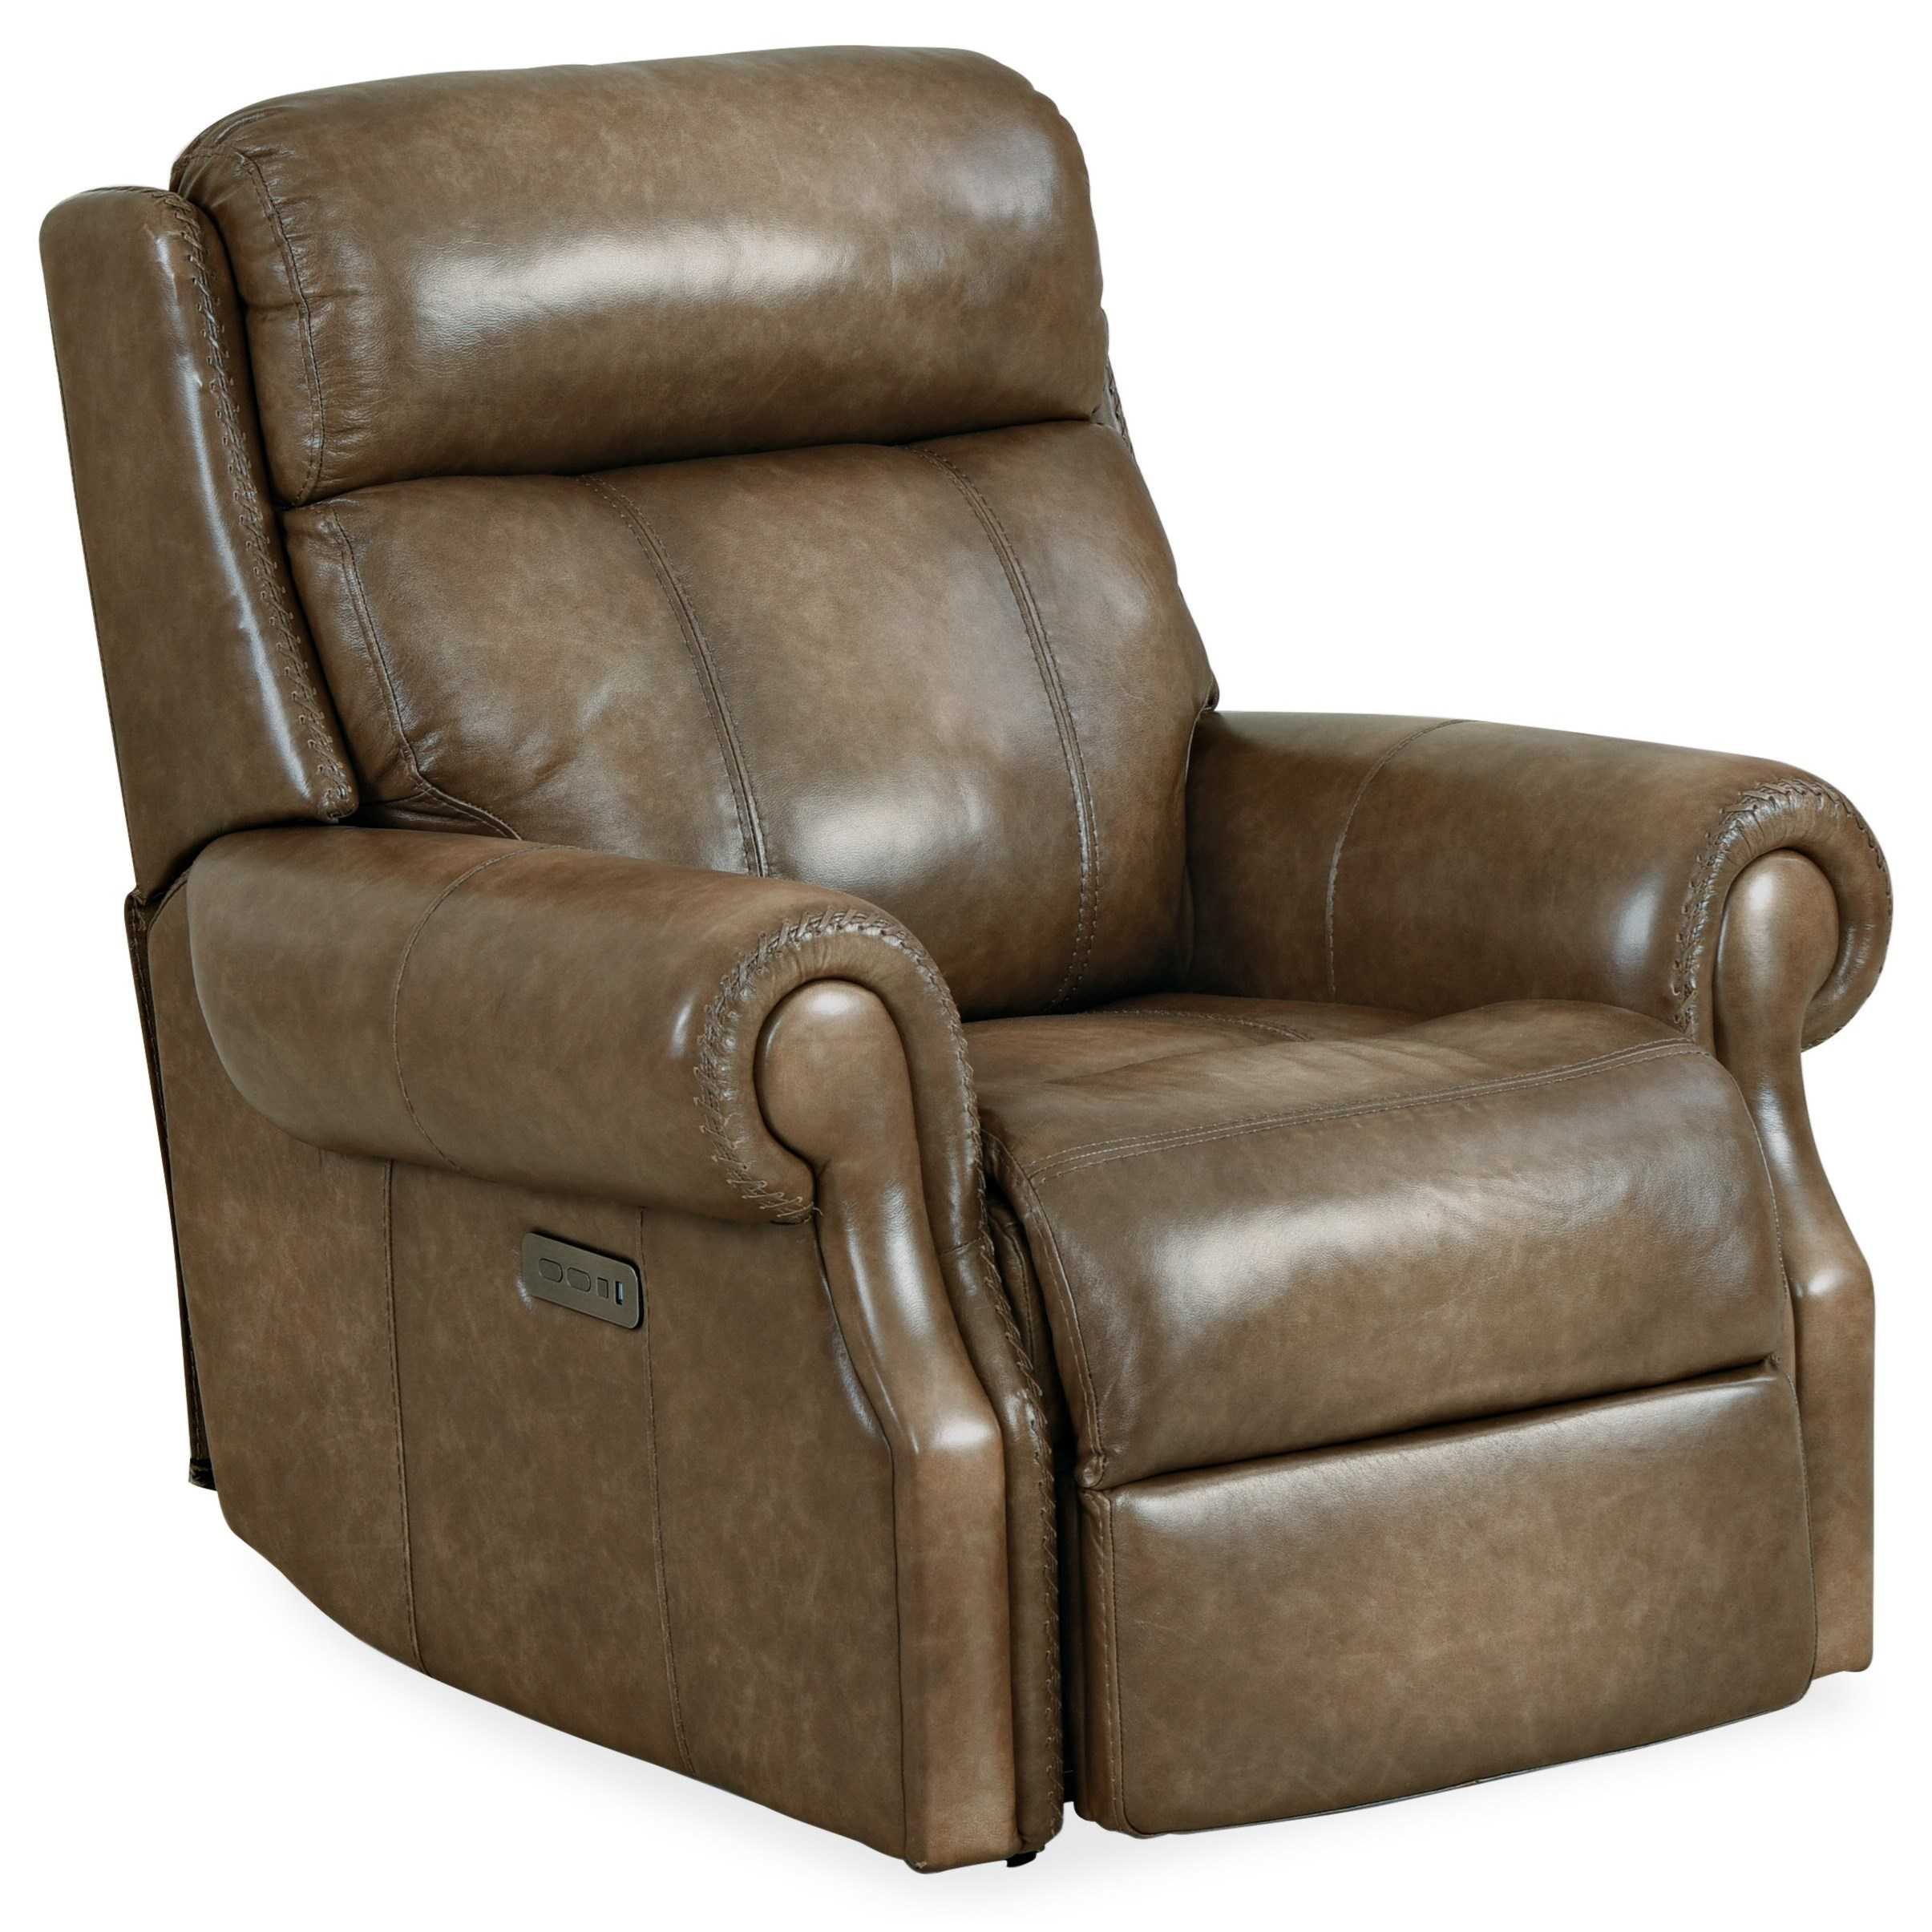 Brooks Power Recliner w/ Power Headrest by Hooker Furniture at Zak's Home